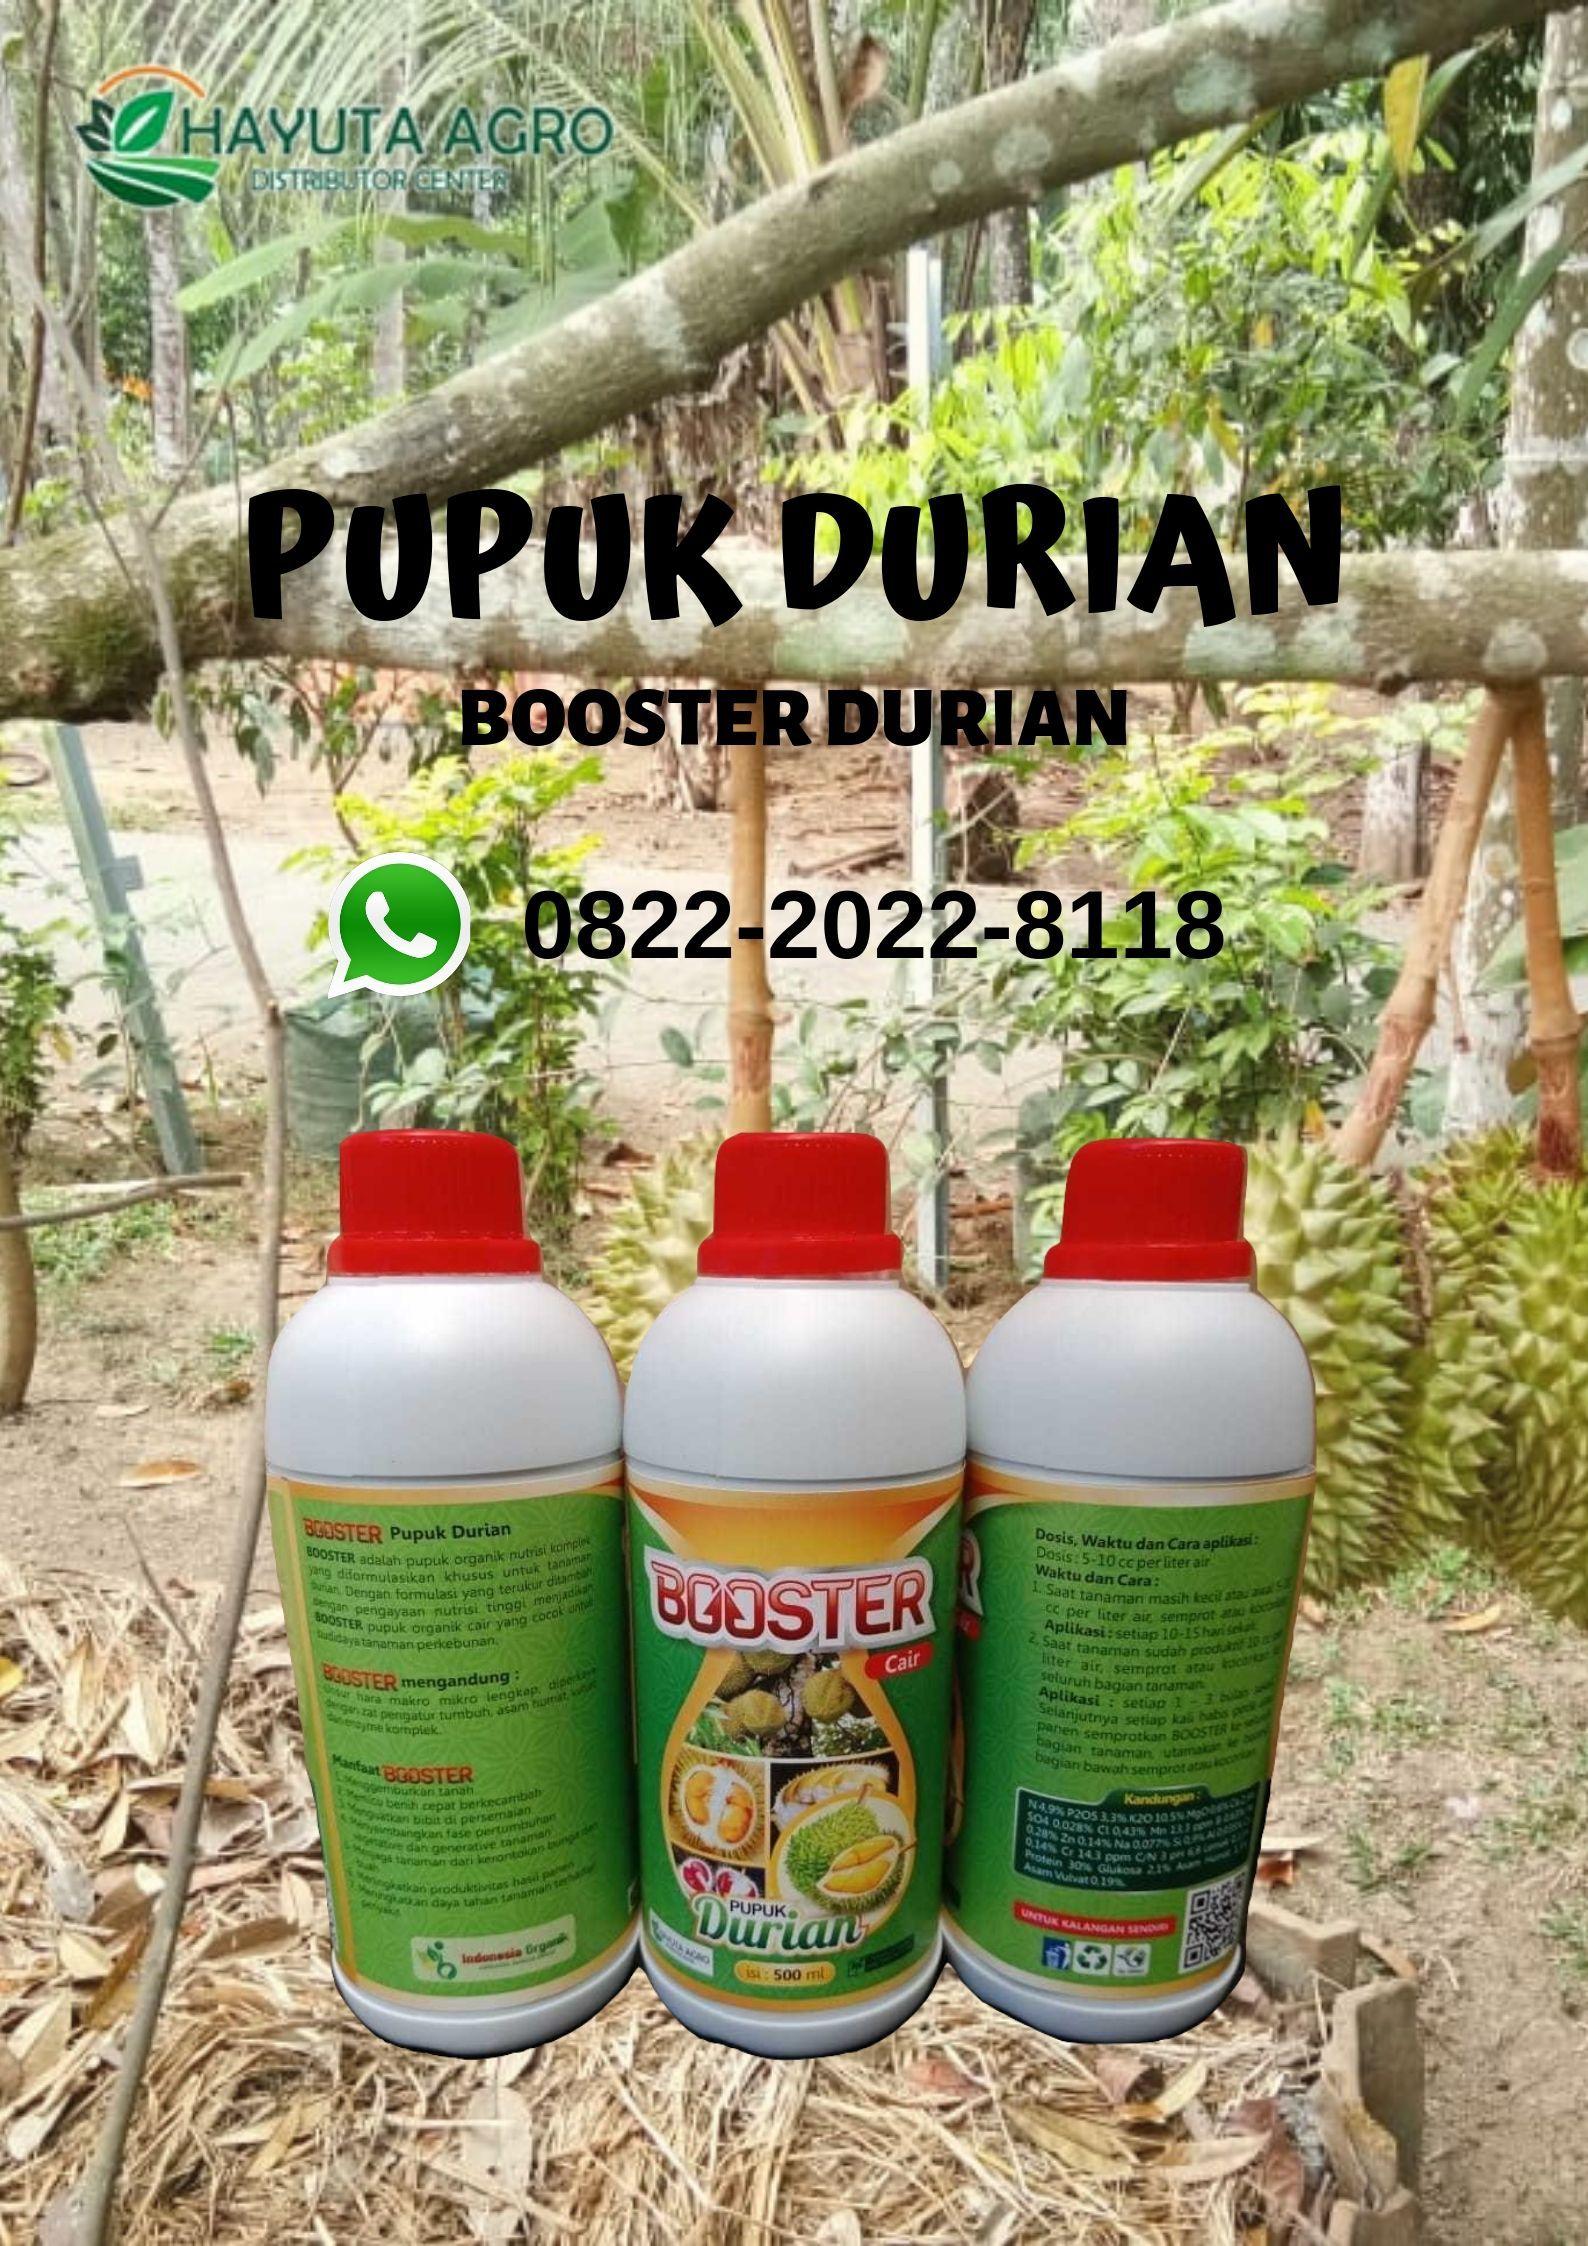 Berkualitas Wa O822 2o22 8ii8 Jual Pupuk Durian Berbuah Di Luar Musim Di Makassar Buah Tanaman Empati